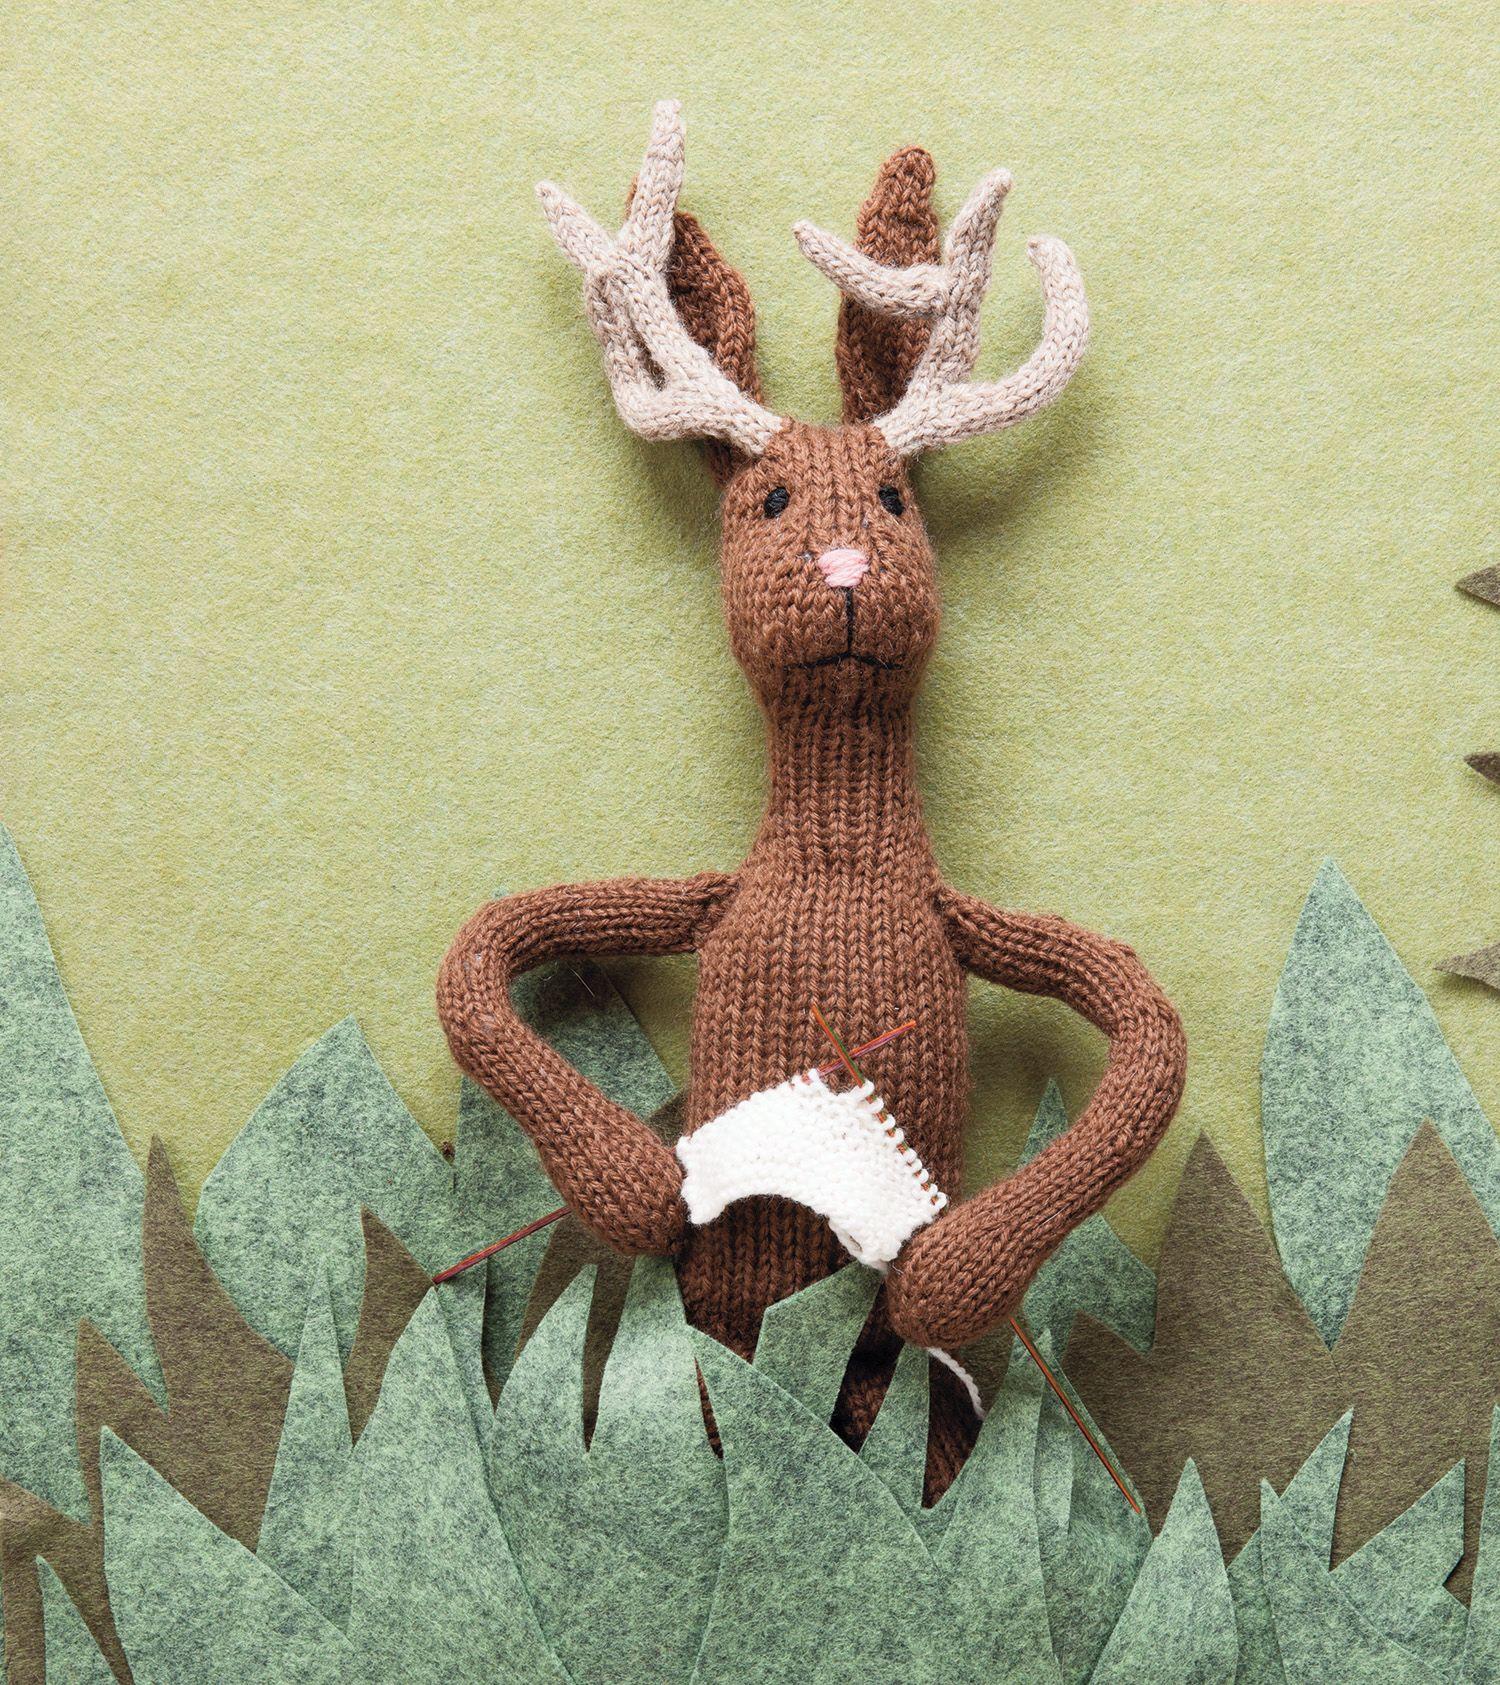 jackalope pattern knitting patterns and crochet patterns from